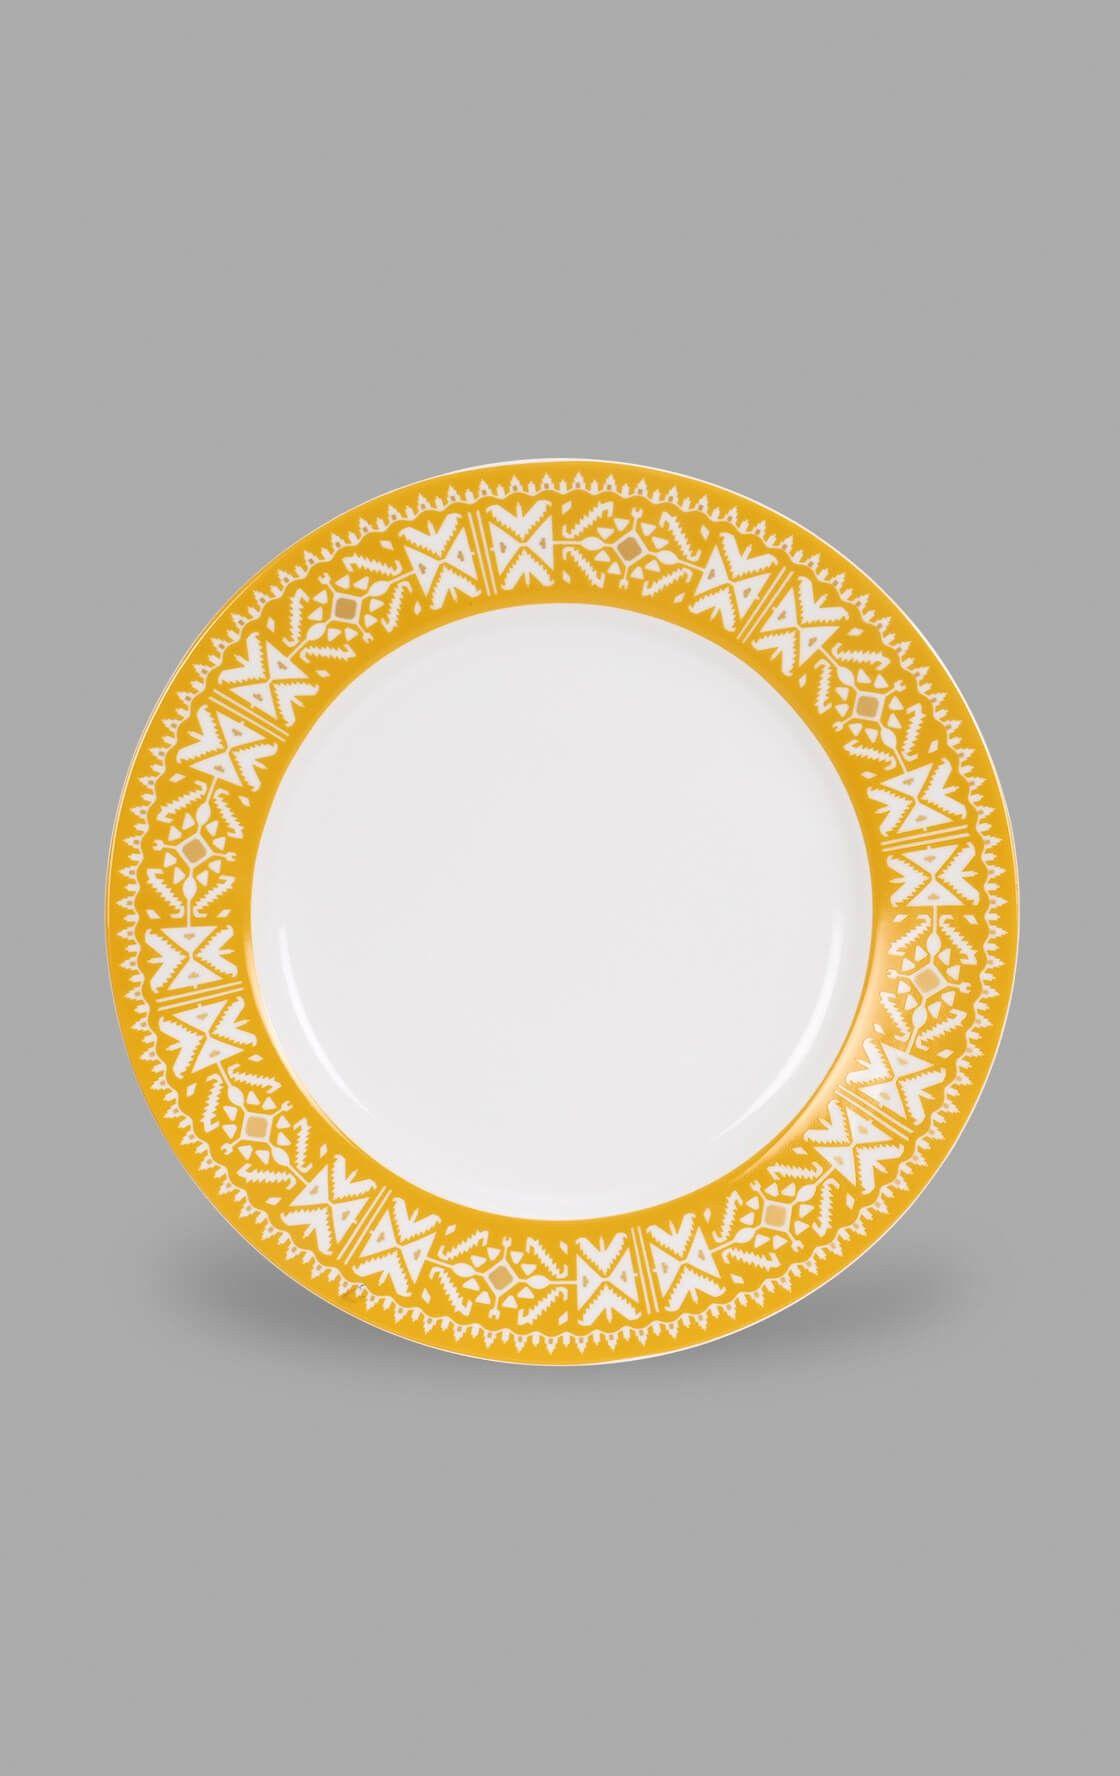 Jamdani Design Pattern Plate Ceramic Aarong Heritage Dhakabangladesh Only In Bangladesh Plates Aarong Ceramics